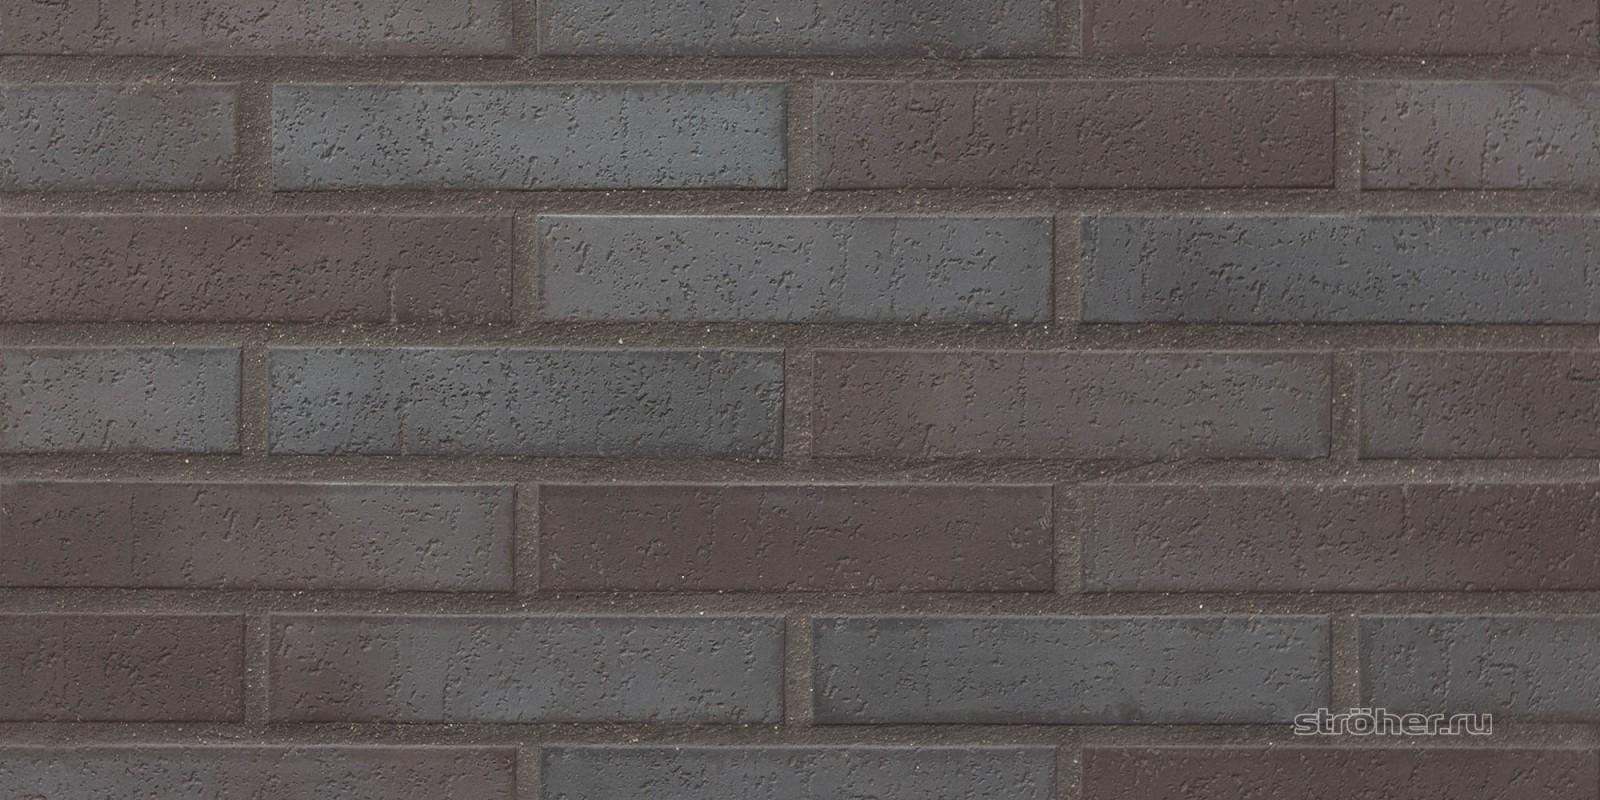 Купить тротуарную плитку для дорожек stroeher spaltklinker 336